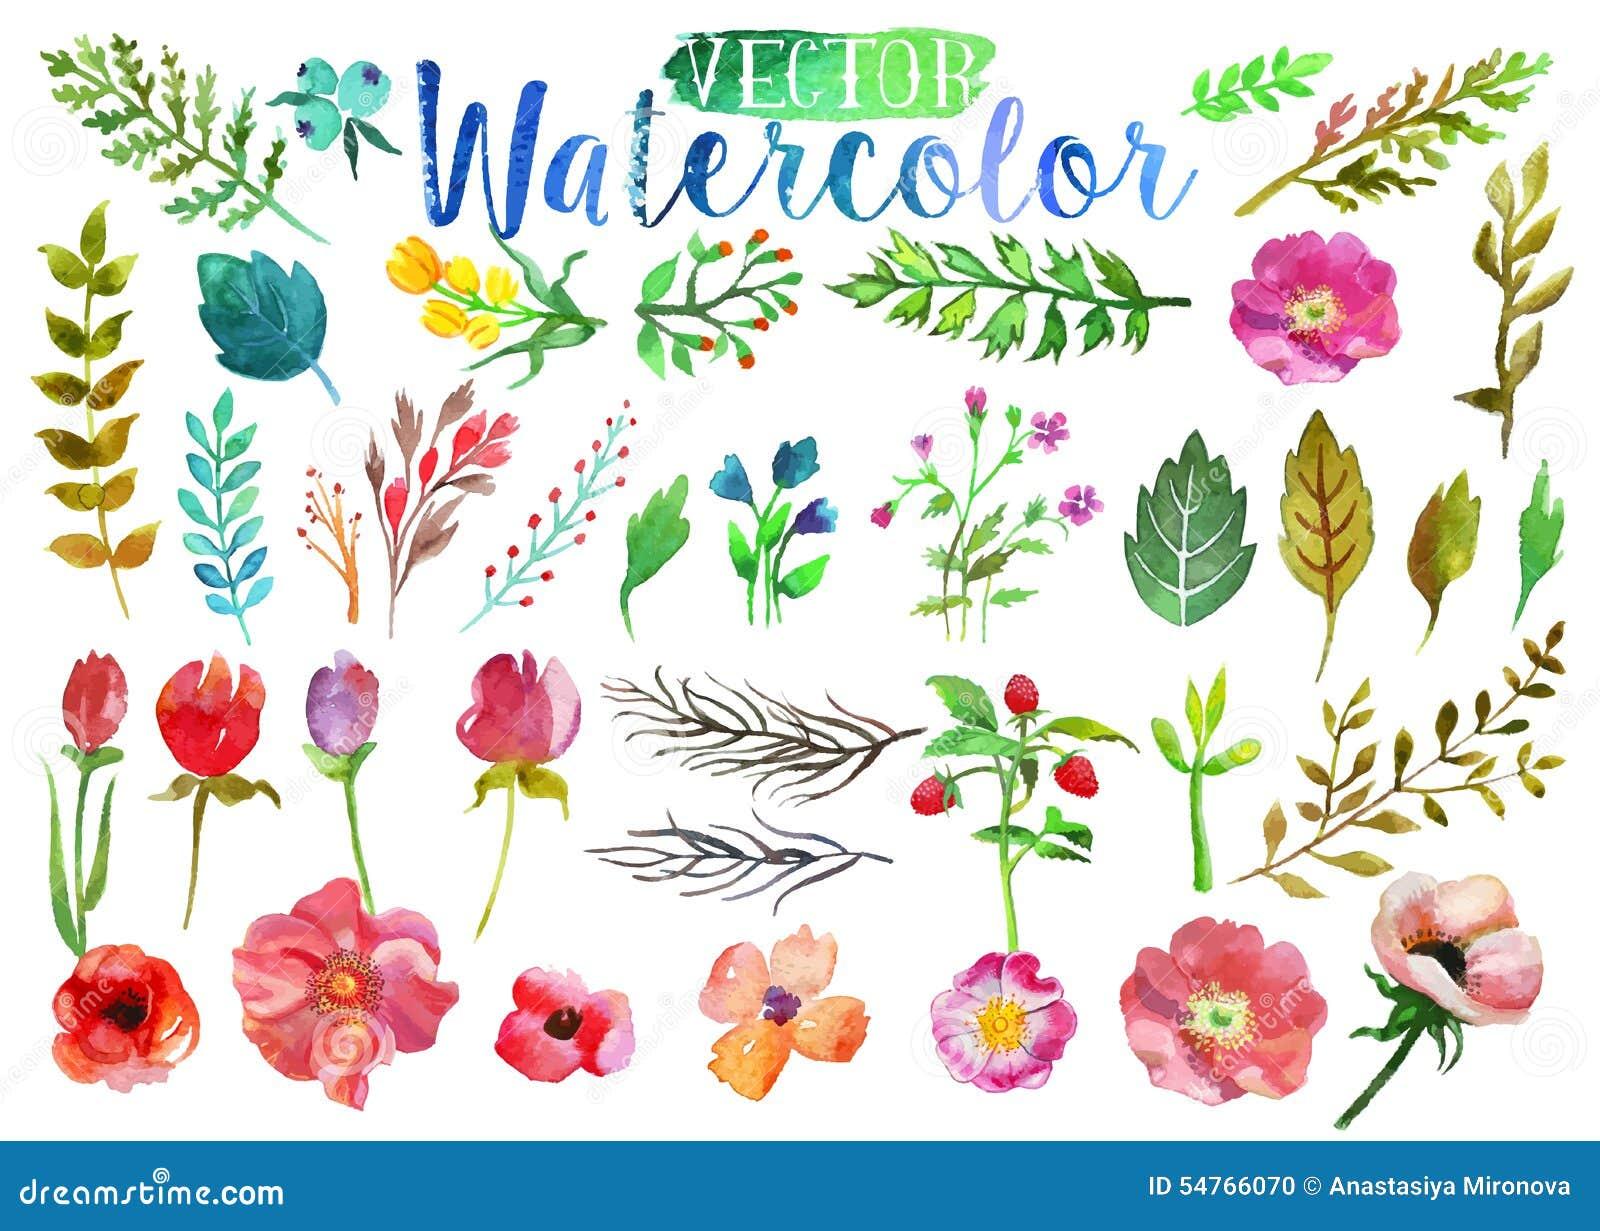 flowers stock illustrations  , flowers stock illustrations, Natural flower